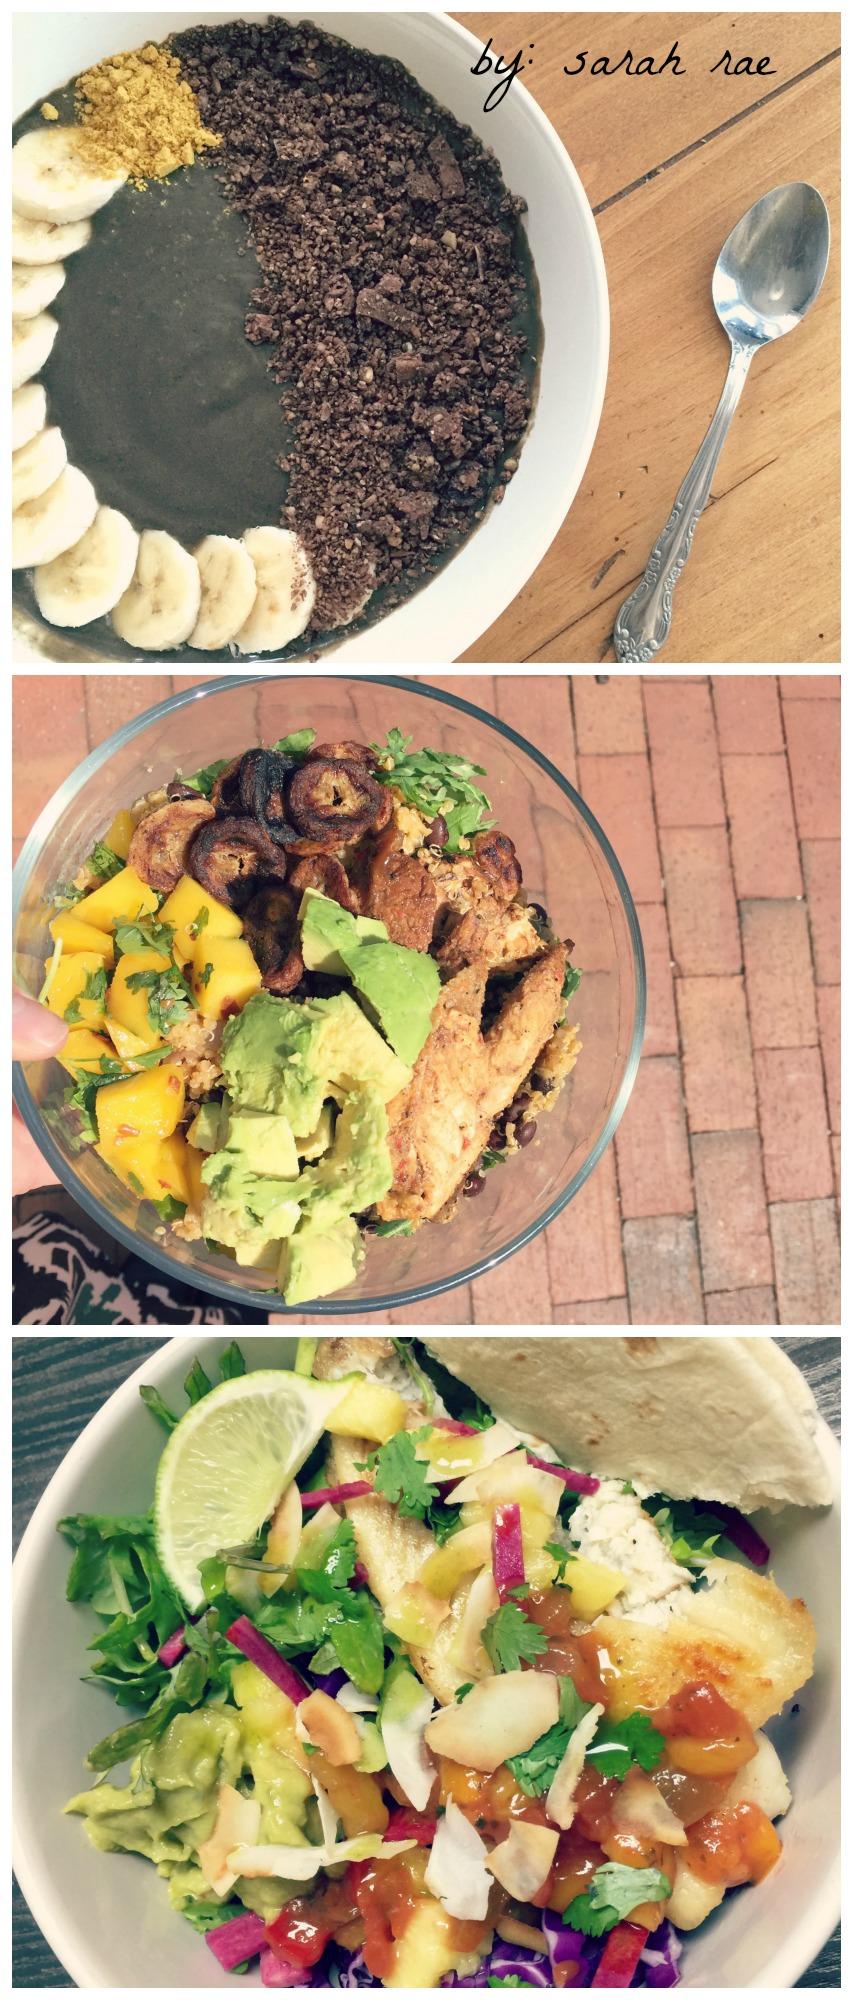 Food-In-Bowls-WIAW.jpg